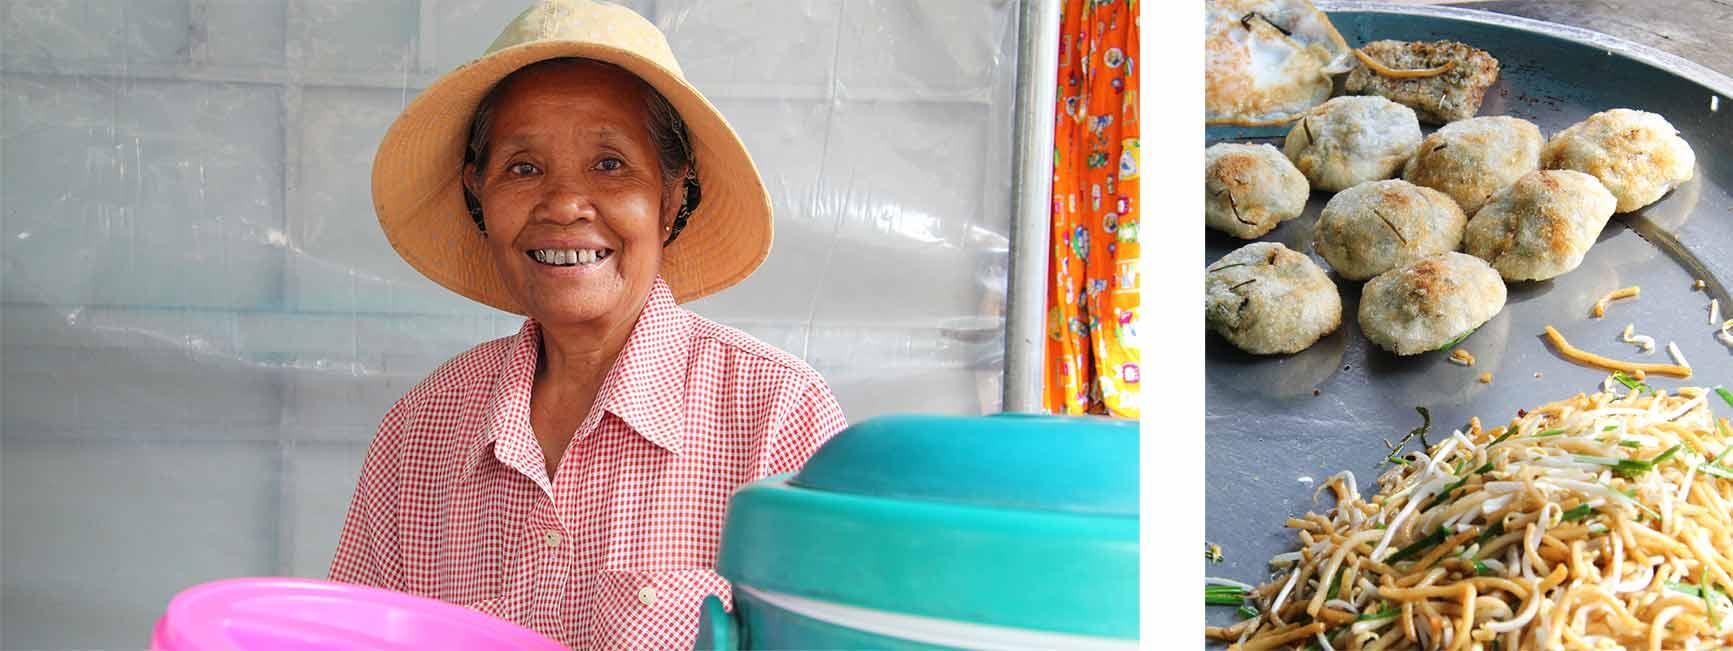 Marktfrau, Siem Reap